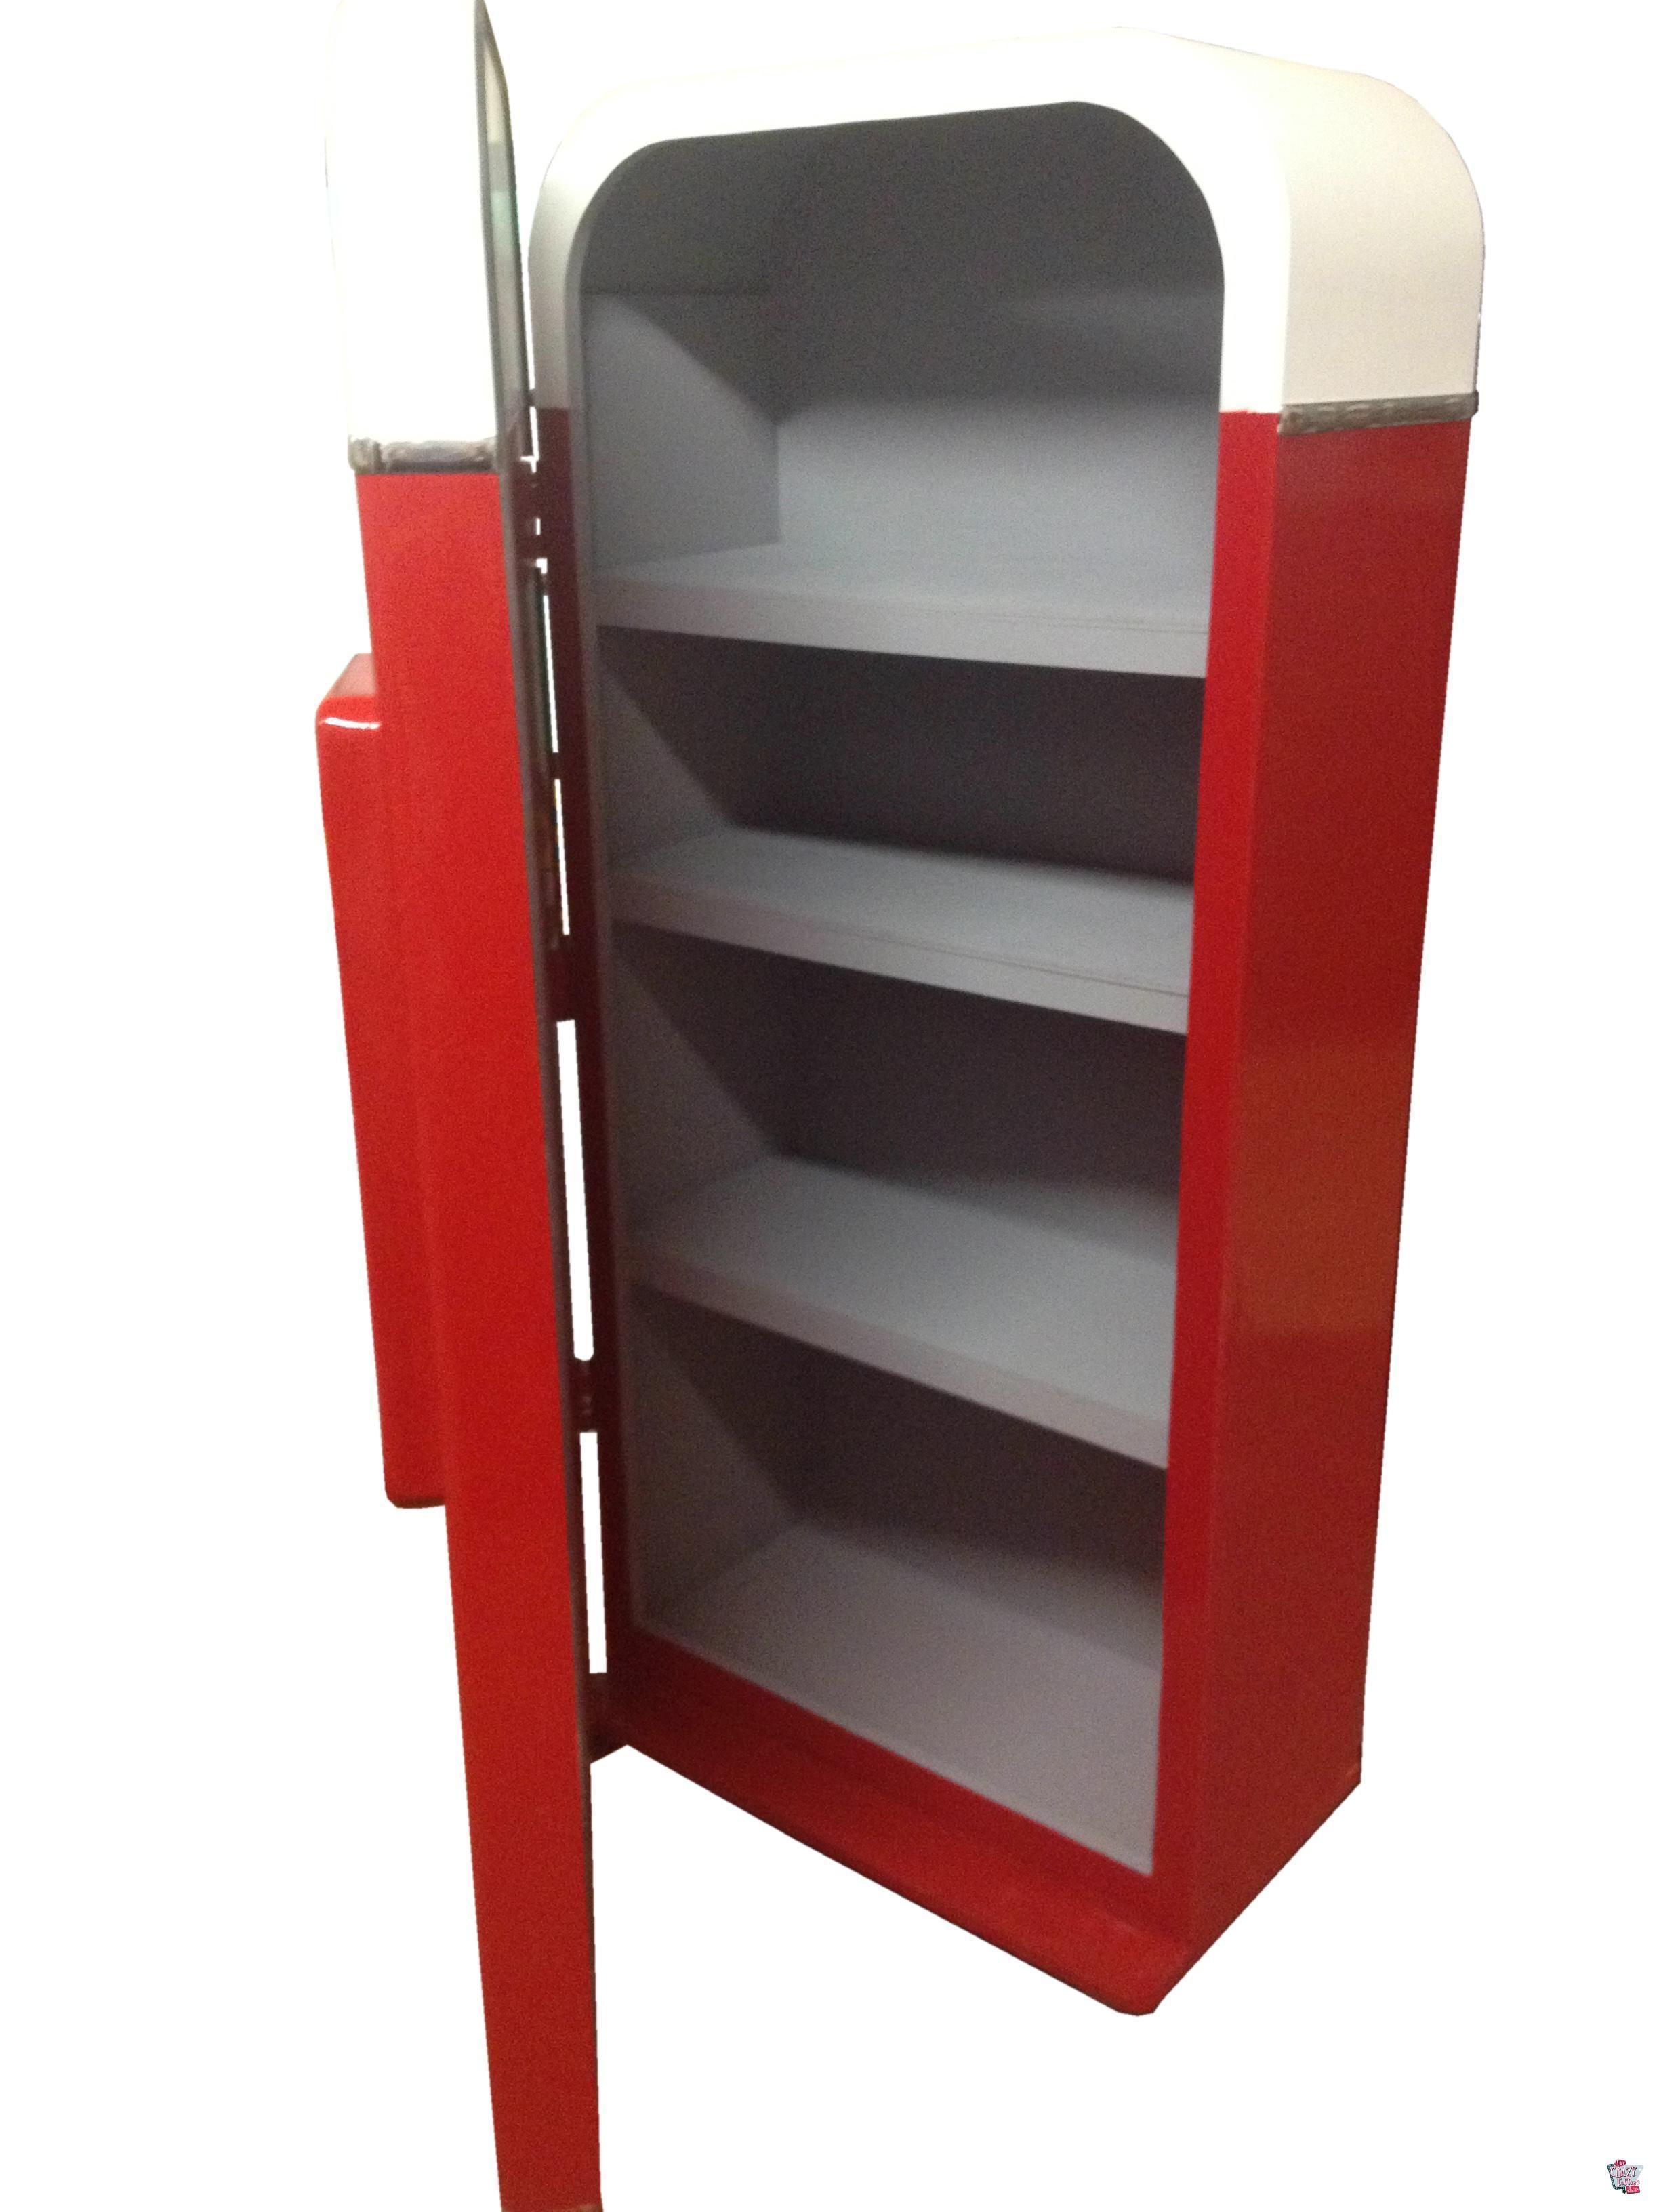 acheter souple armoire boissons machine v81. Black Bedroom Furniture Sets. Home Design Ideas